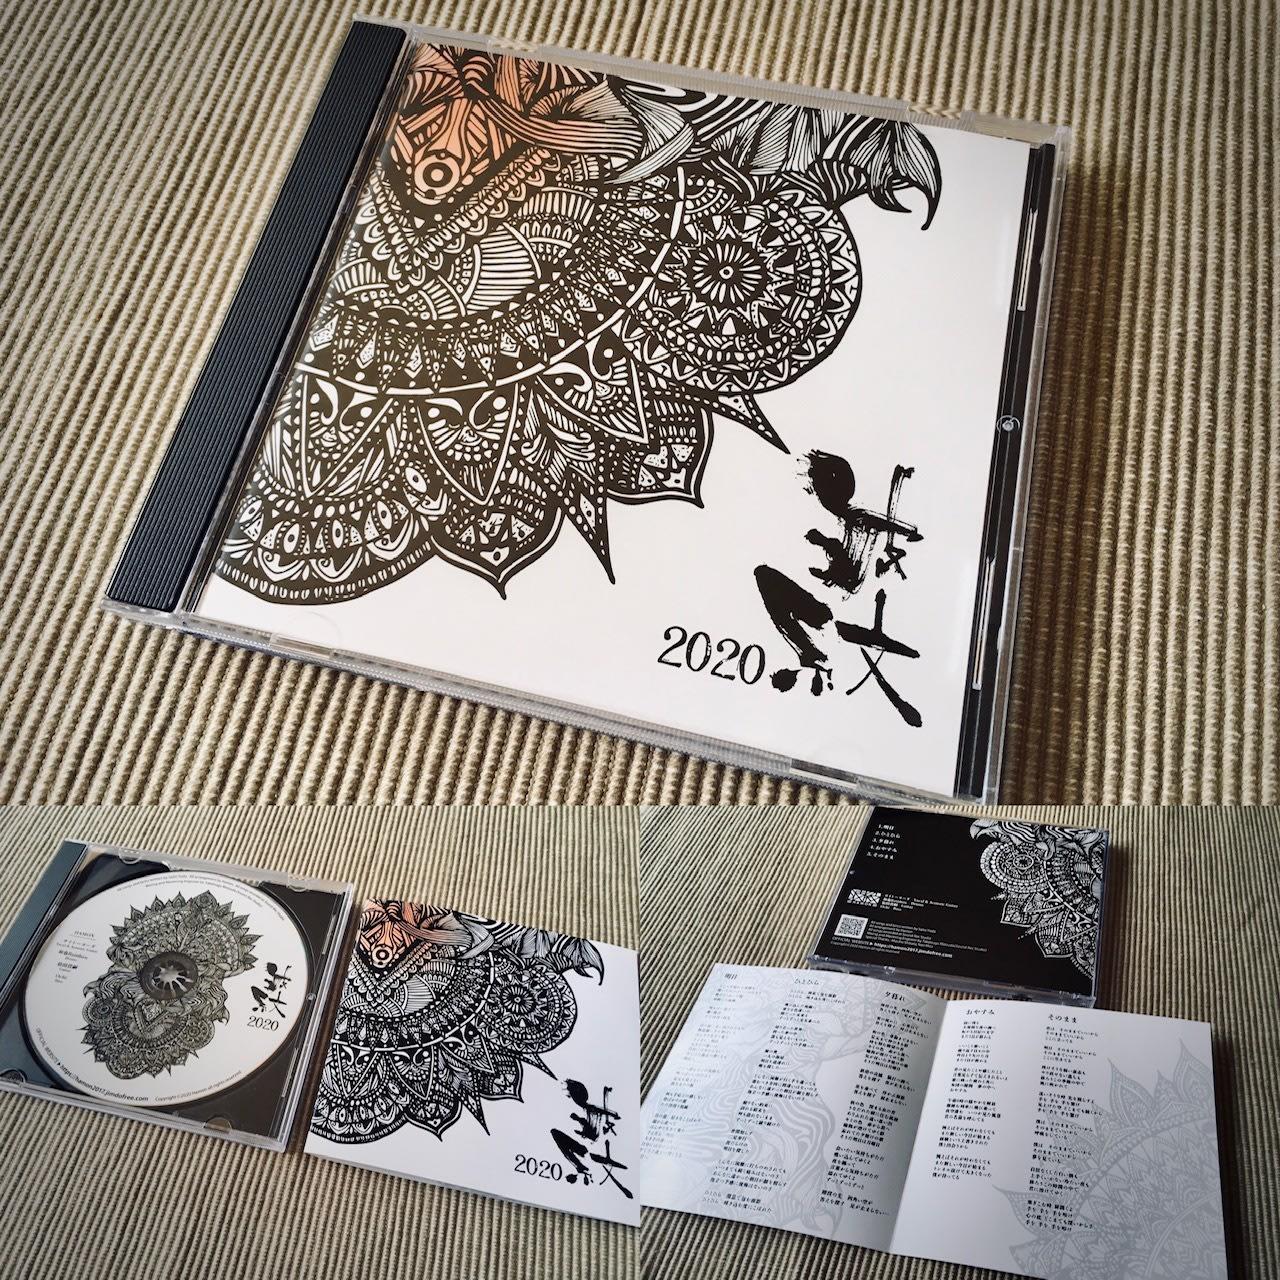 3rd アルバム「波紋2020」の画像